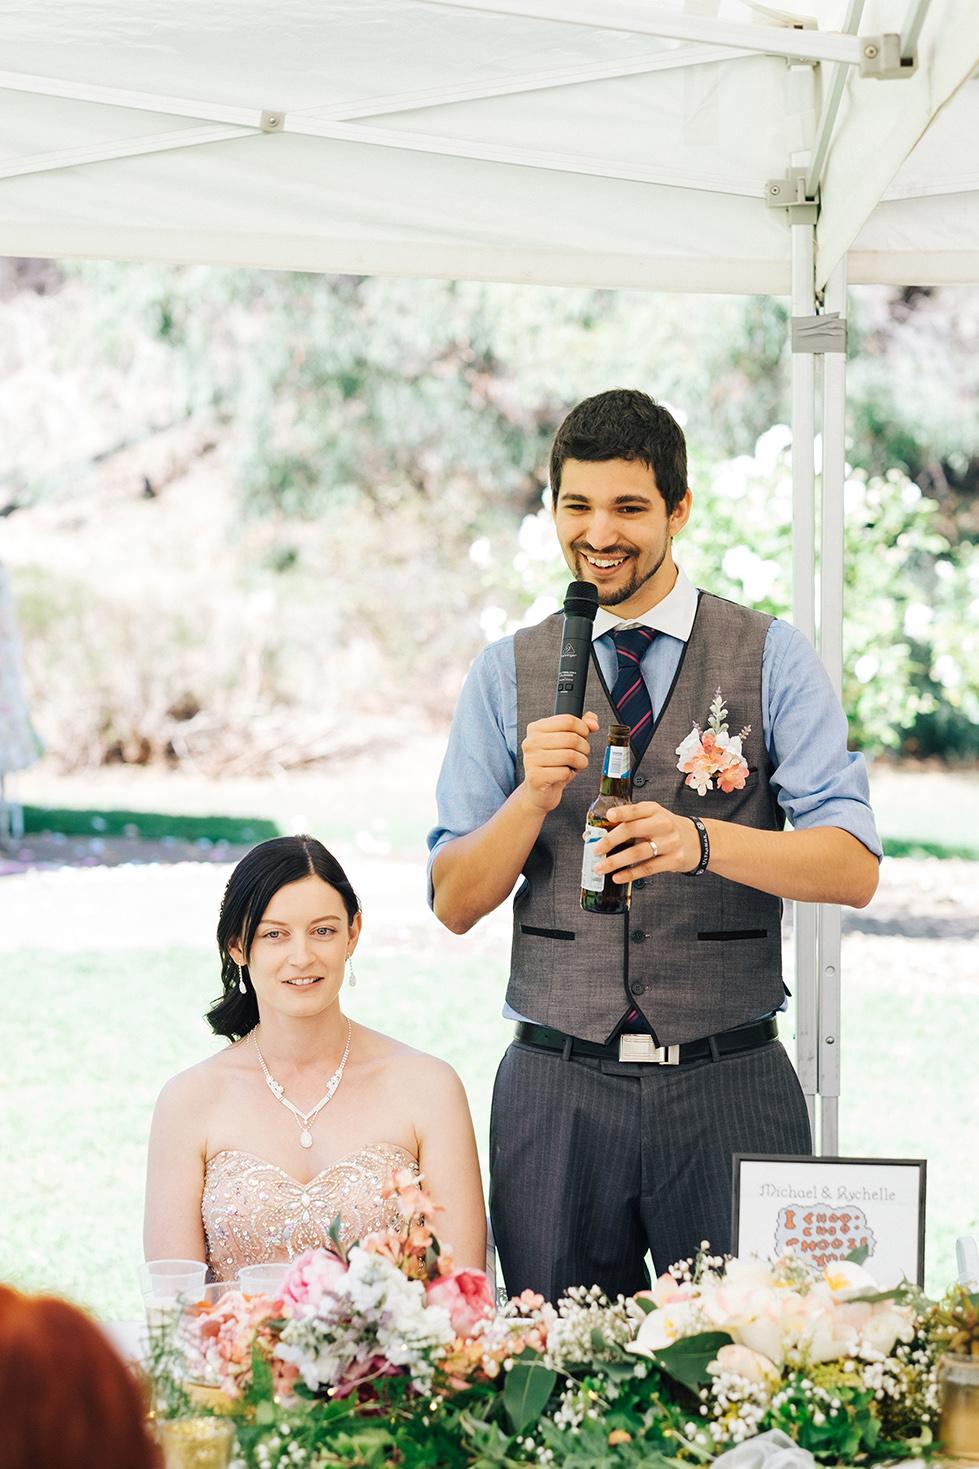 Garden Picnic Wedding 67.jpg